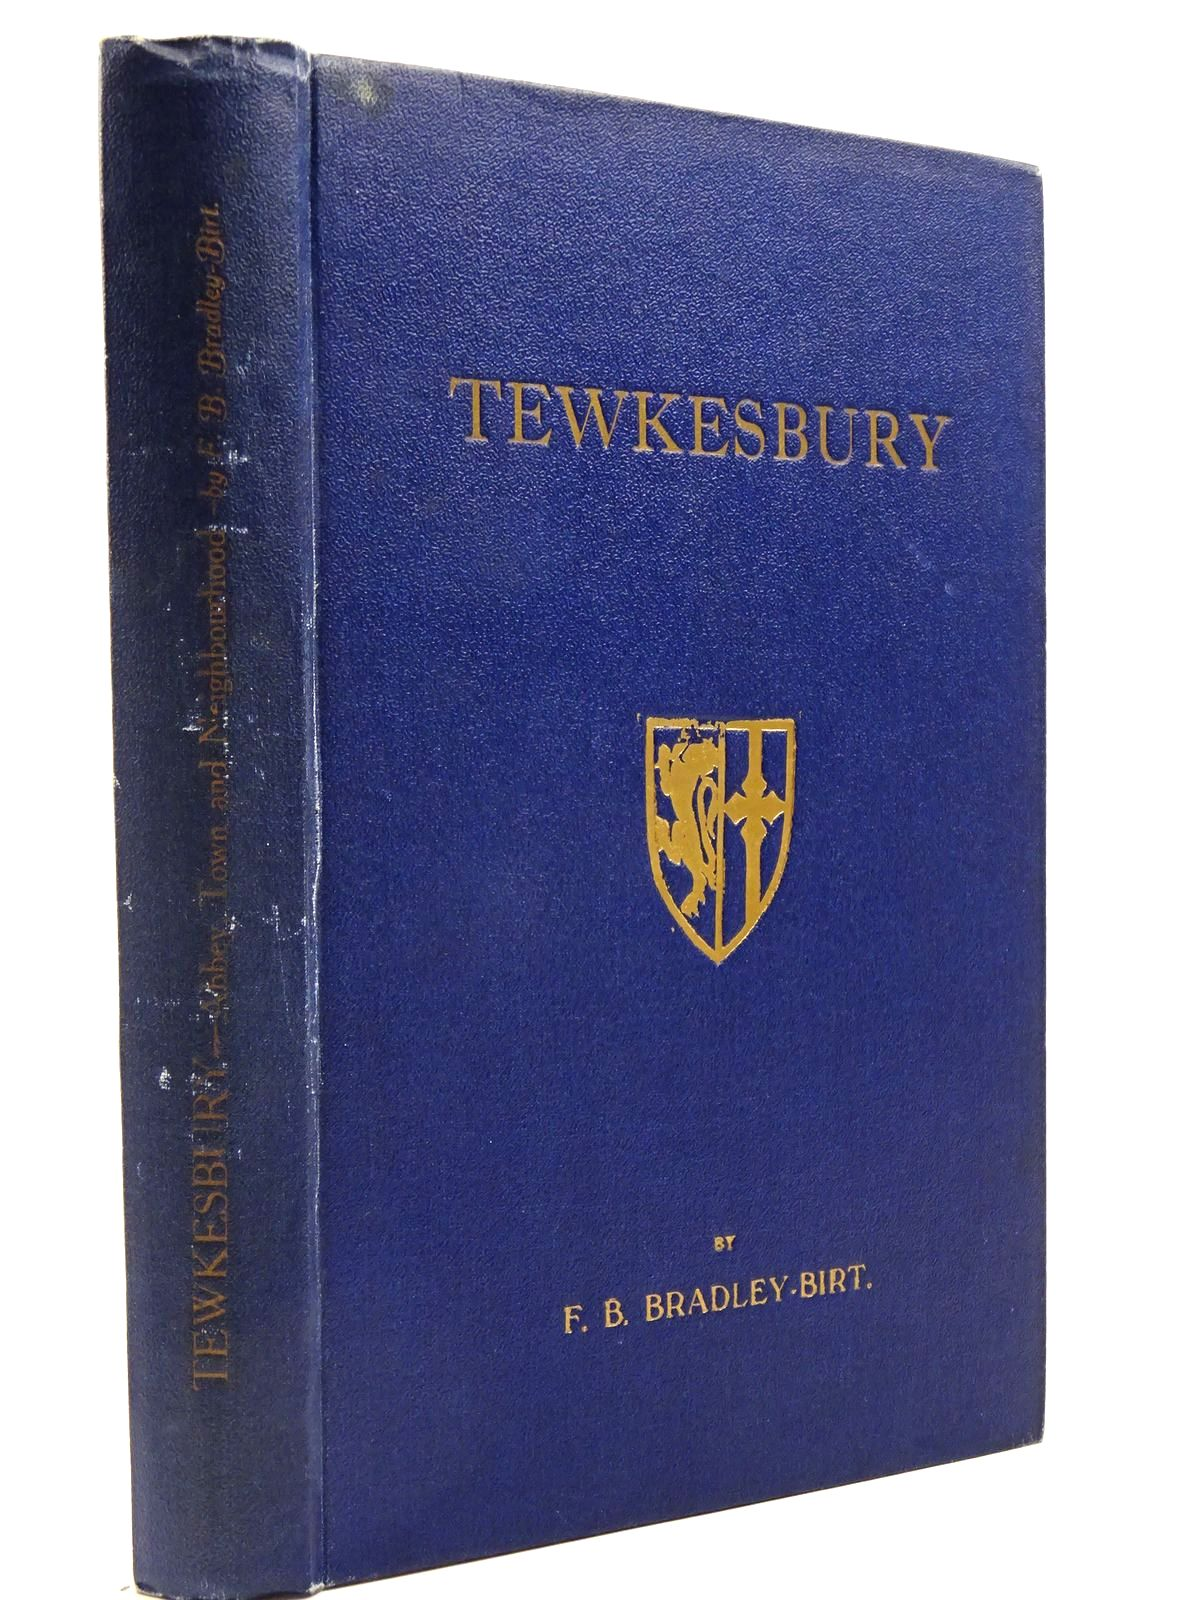 Photo of TEWKESBURY- Stock Number: 2130894